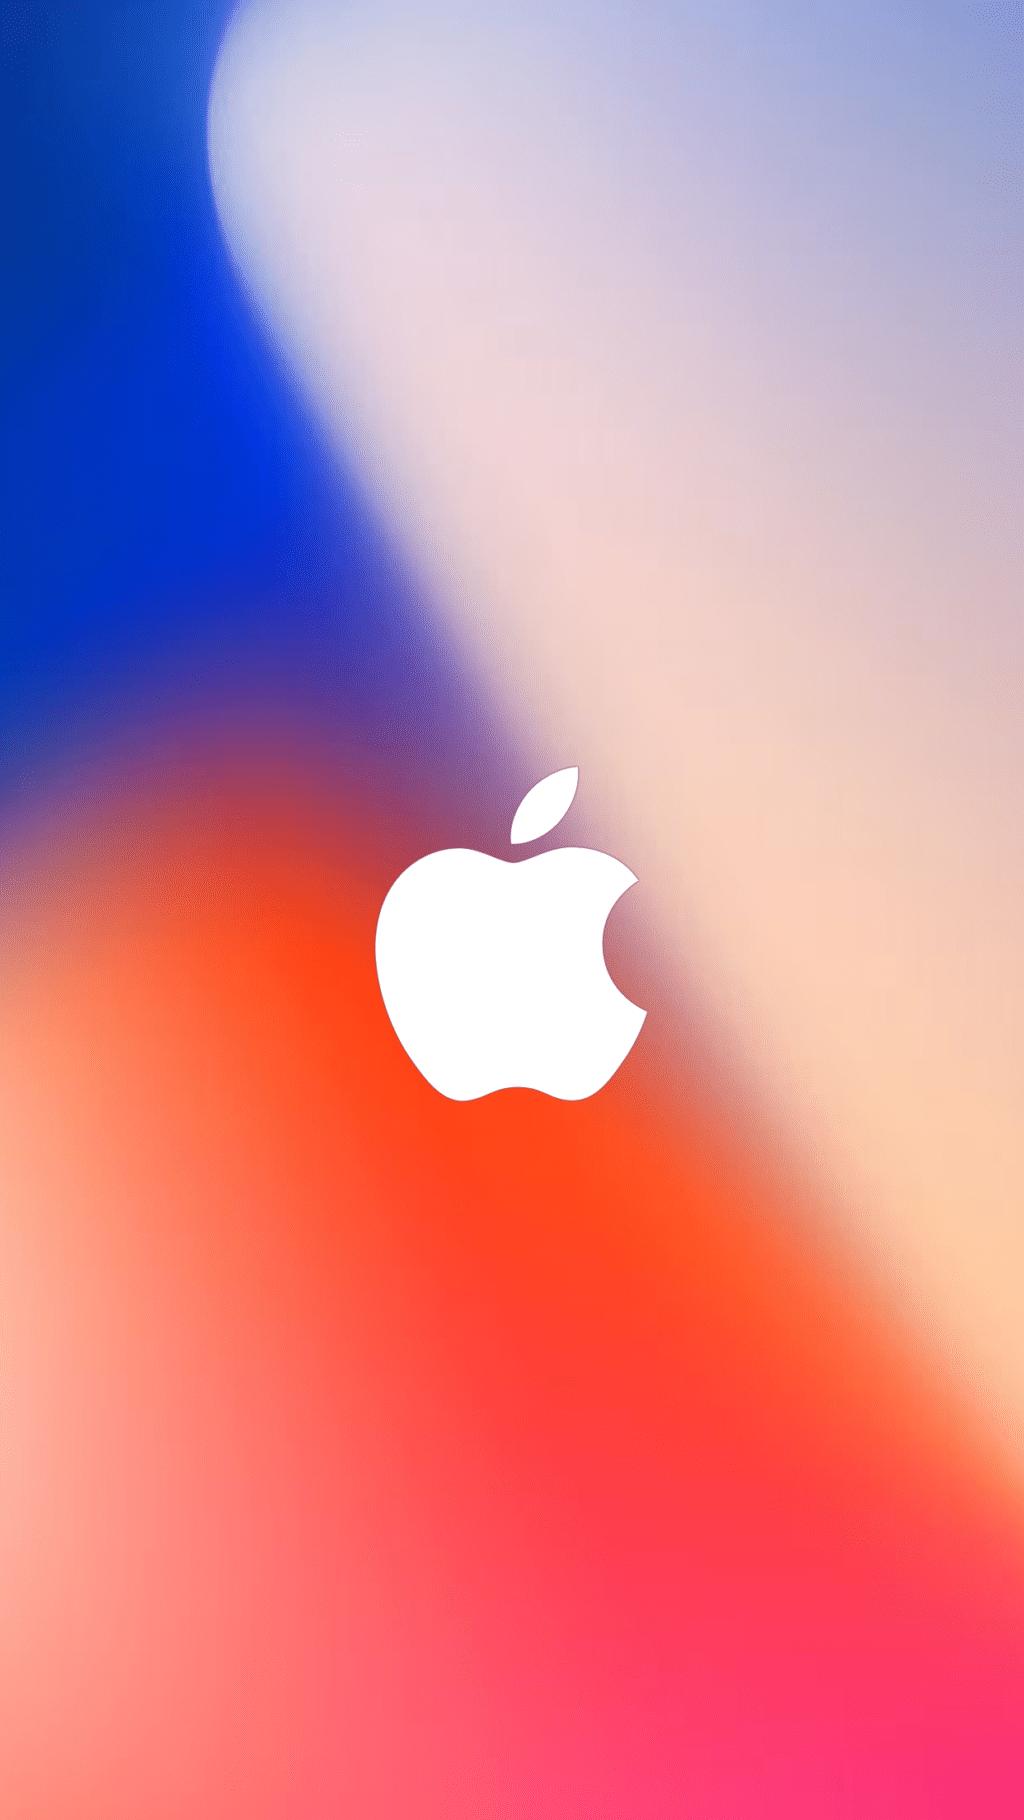 100 Apple On Twitter Apple Logo Wallpaper Iphone Apple Logo Wallpaper Apple Wallpaper Iphone